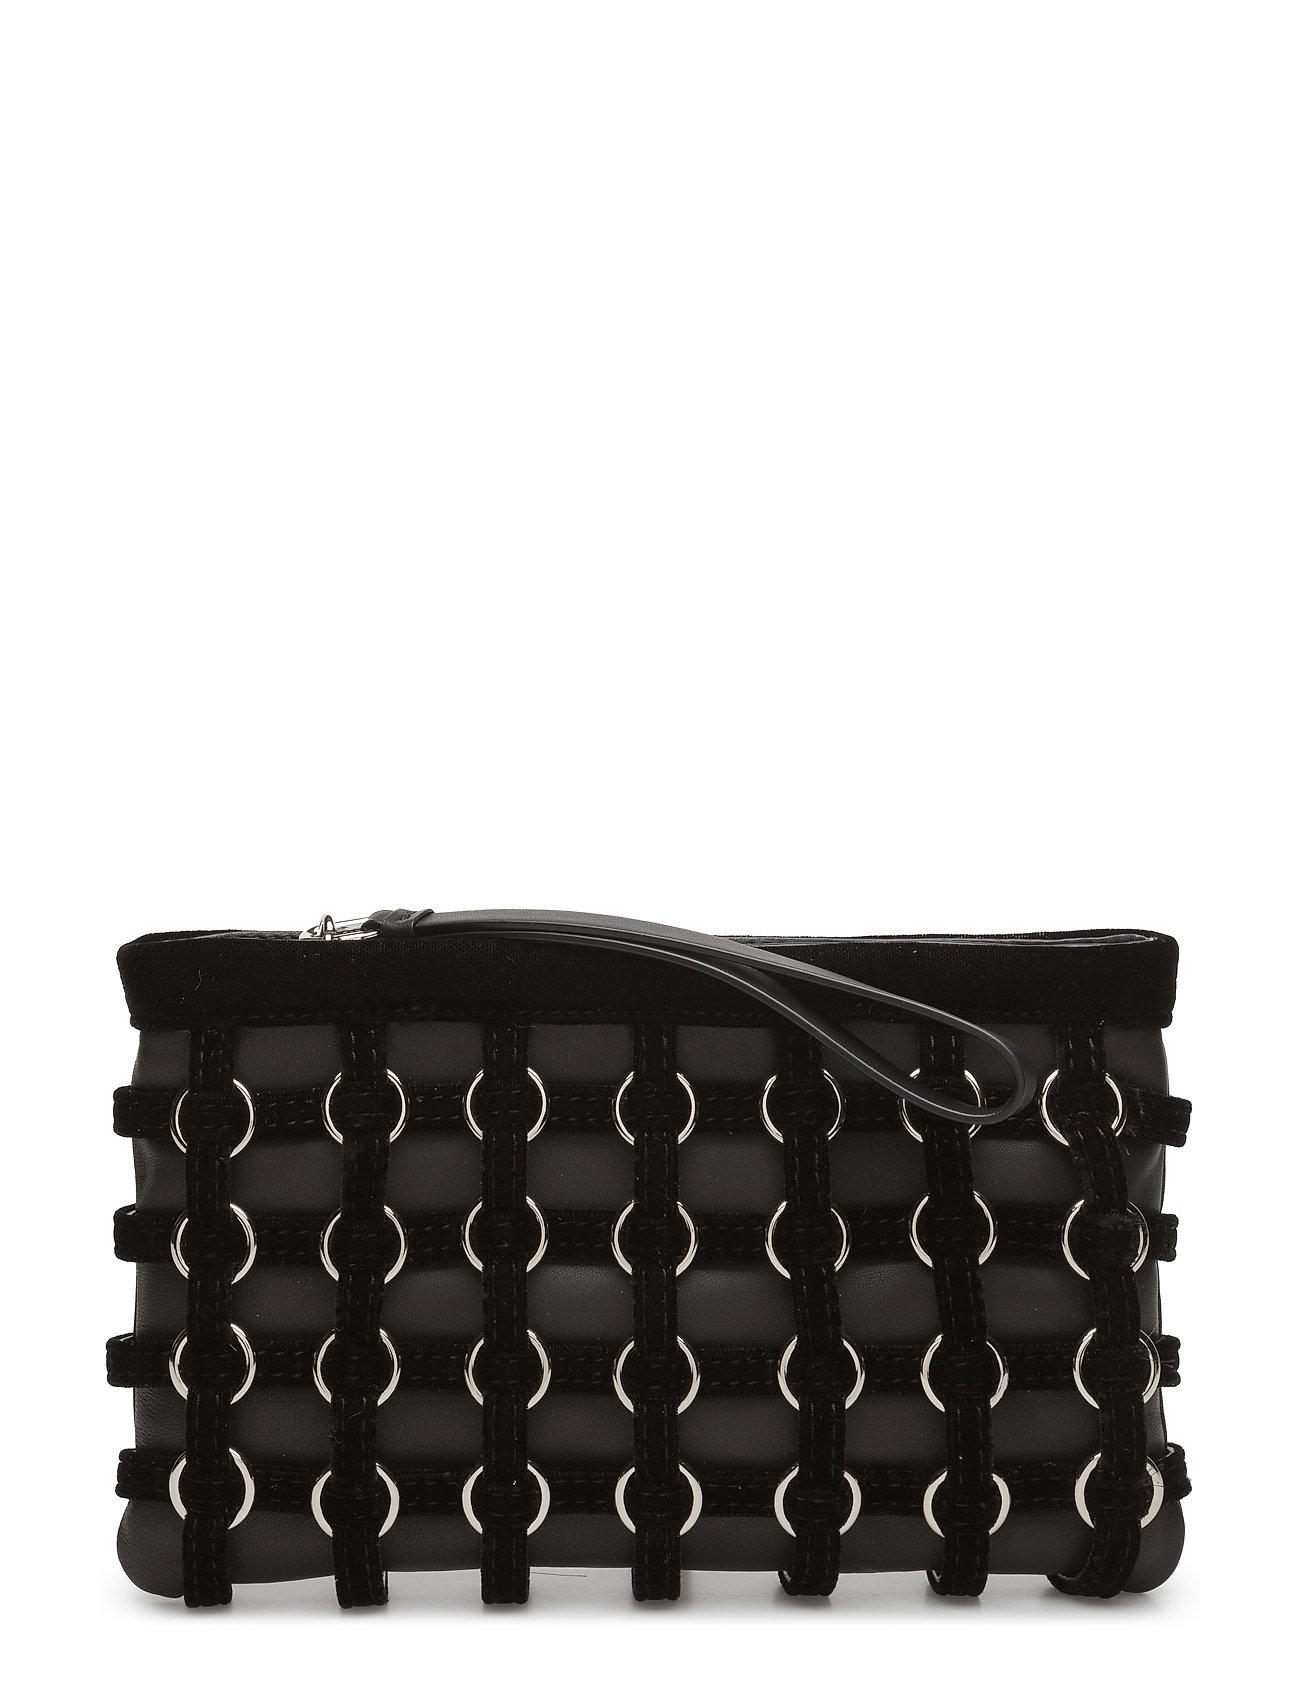 alexander wang Roxy cage pouch black hvysilky velvet/pv fra boozt.com dk